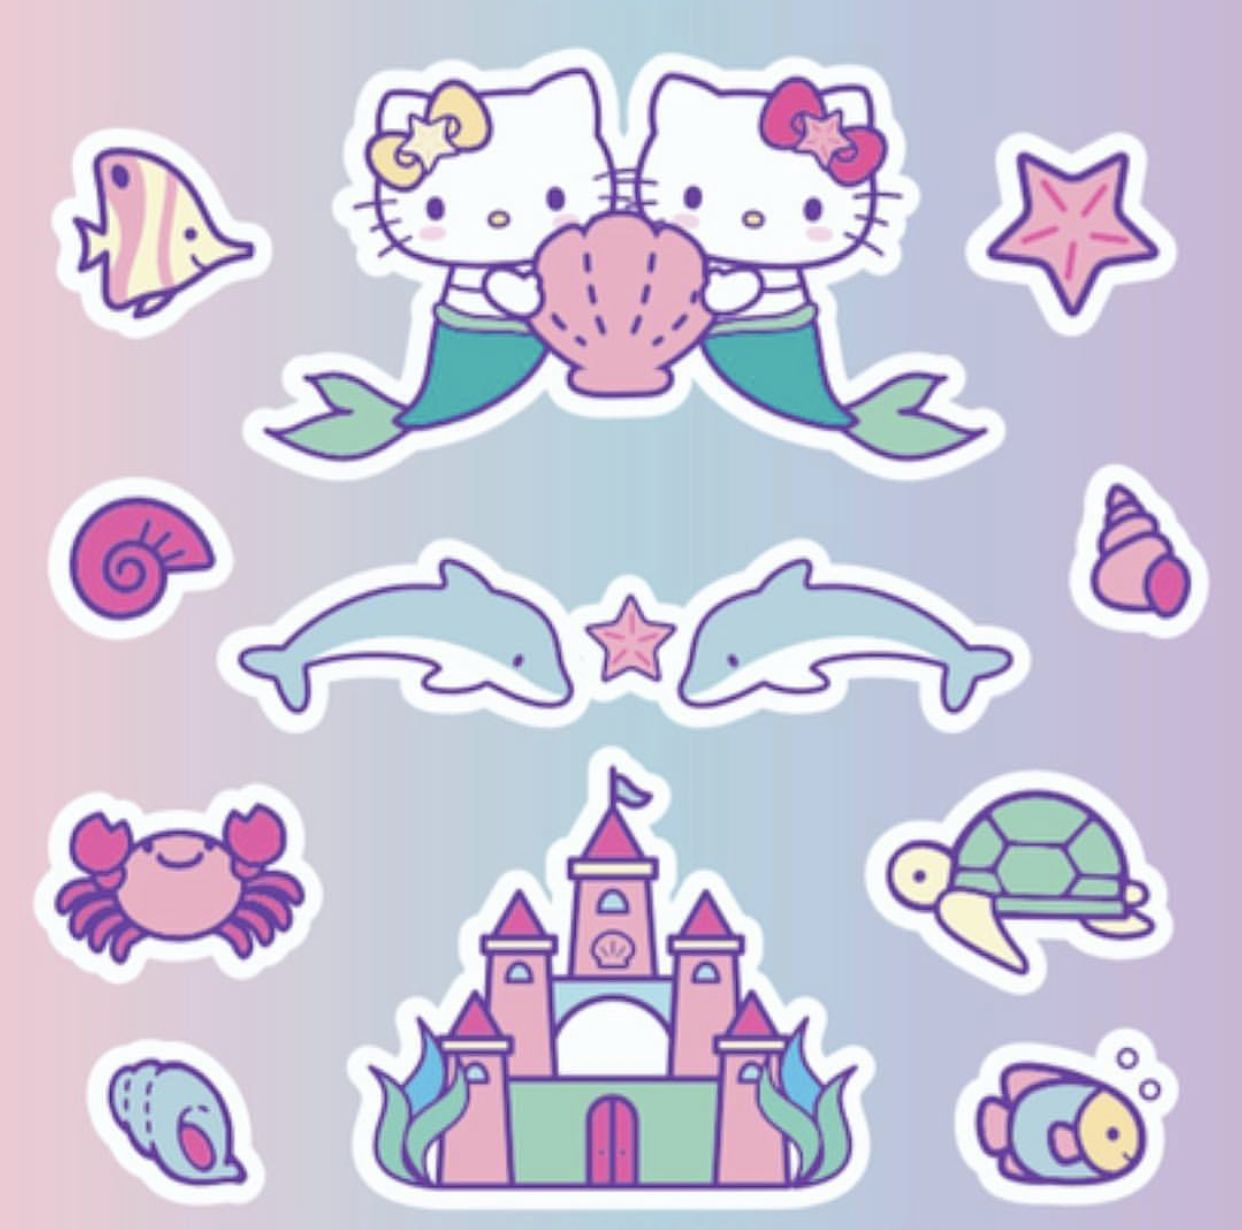 Underwater Mermaid Die Cut Stickers for Planner Decorations Pink